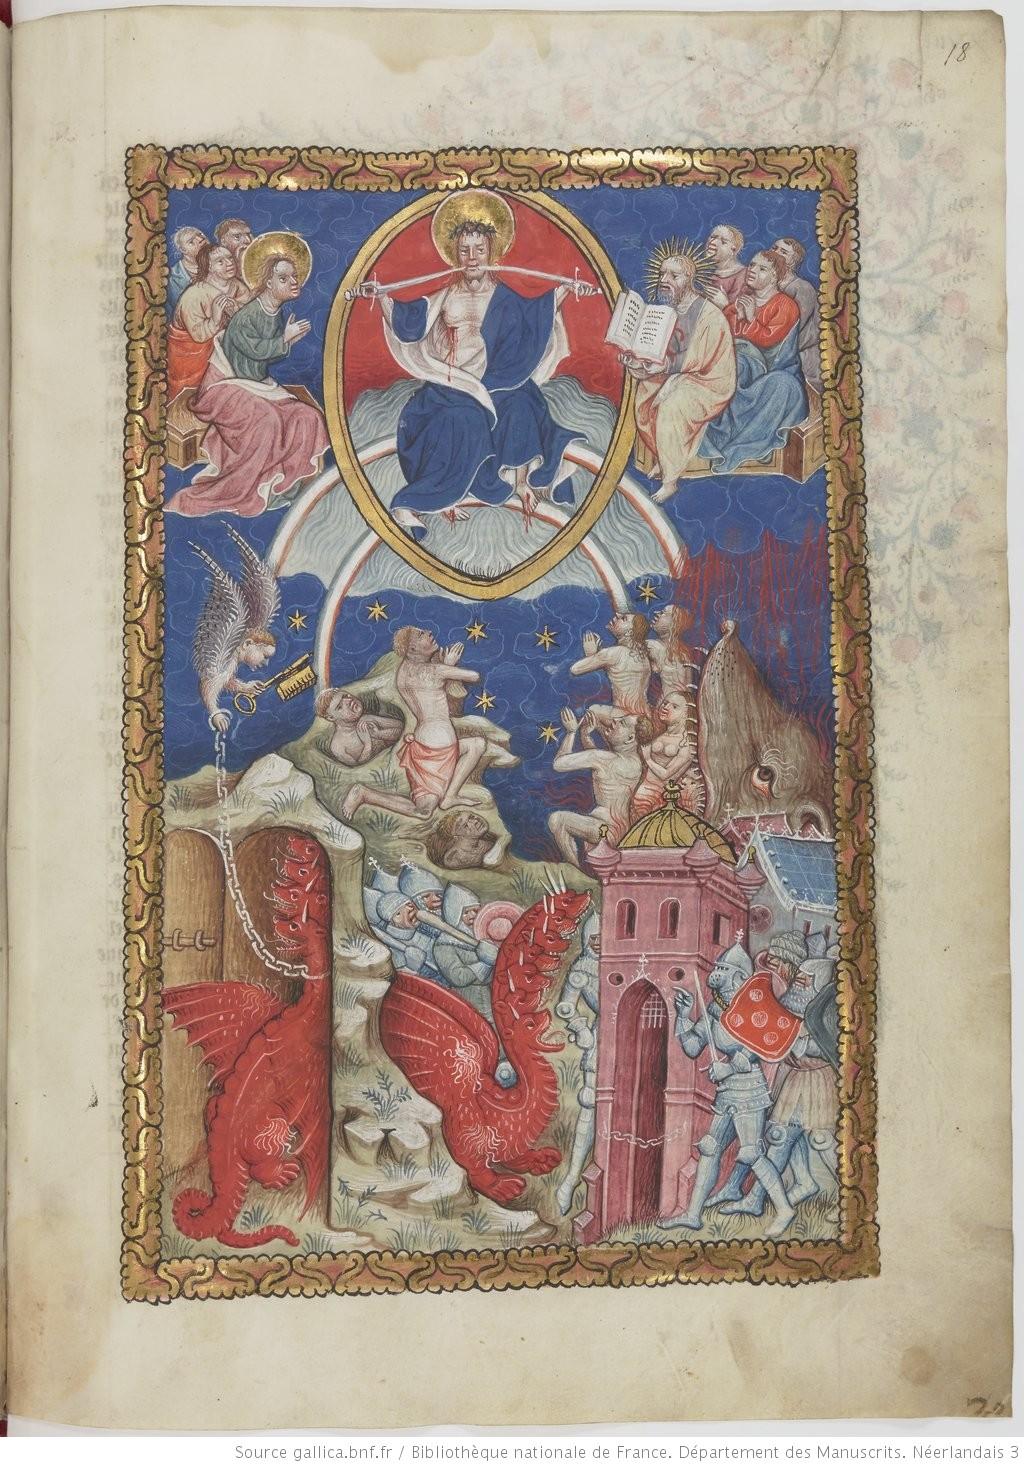 Apocalipsis in dietsche 1400 -50 BNF Ms. Neerlandais 3 fol 18r